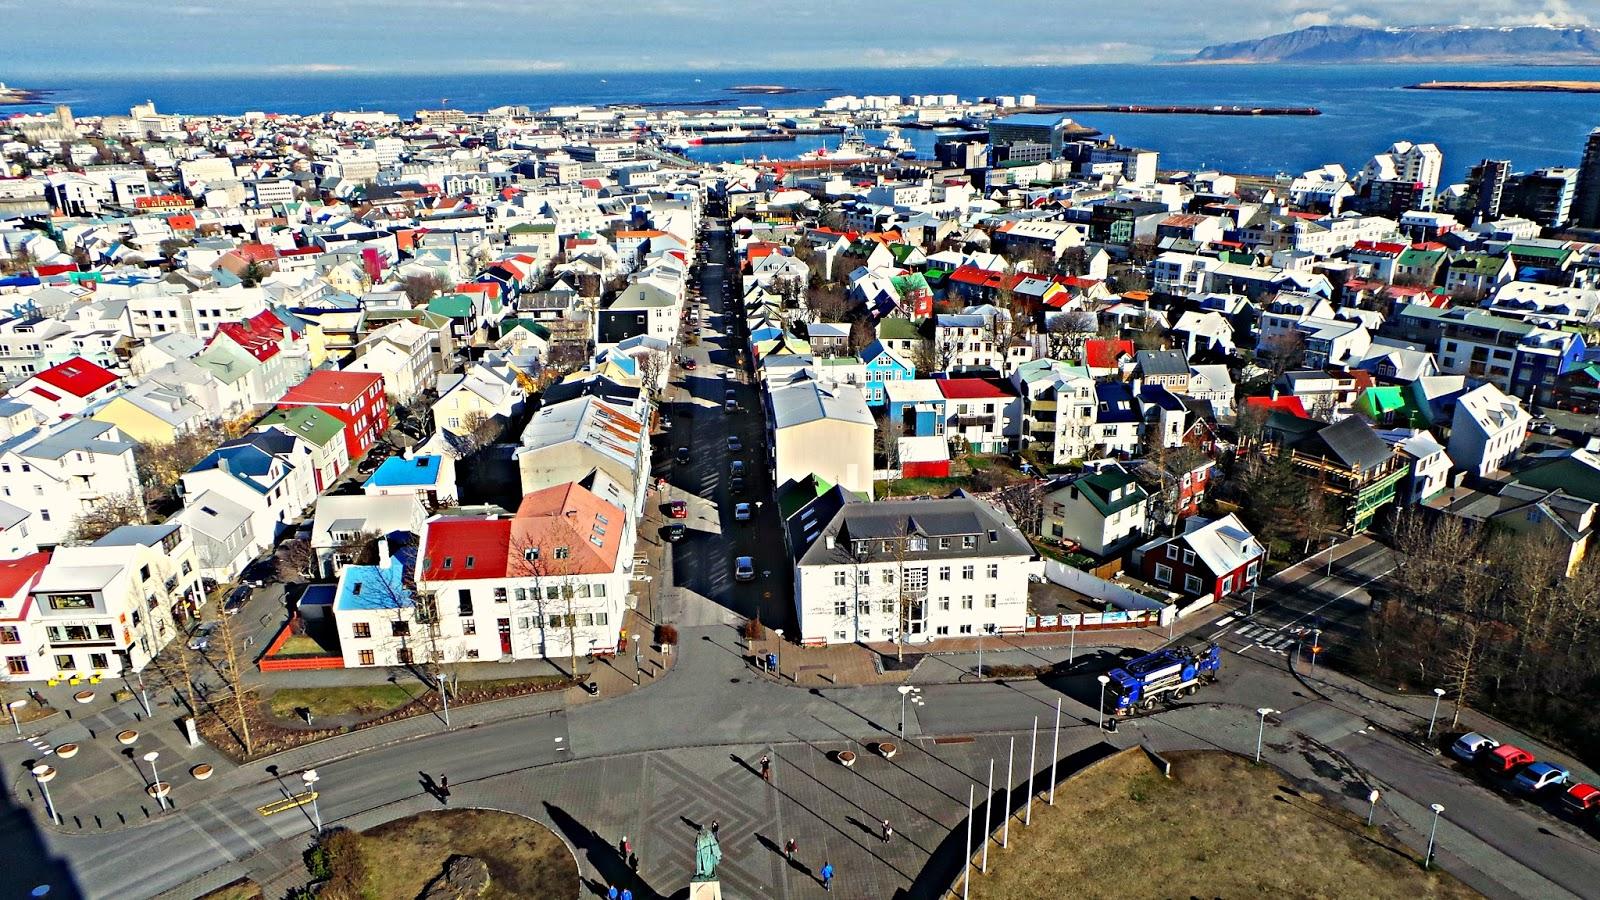 Reykjavik ariel view